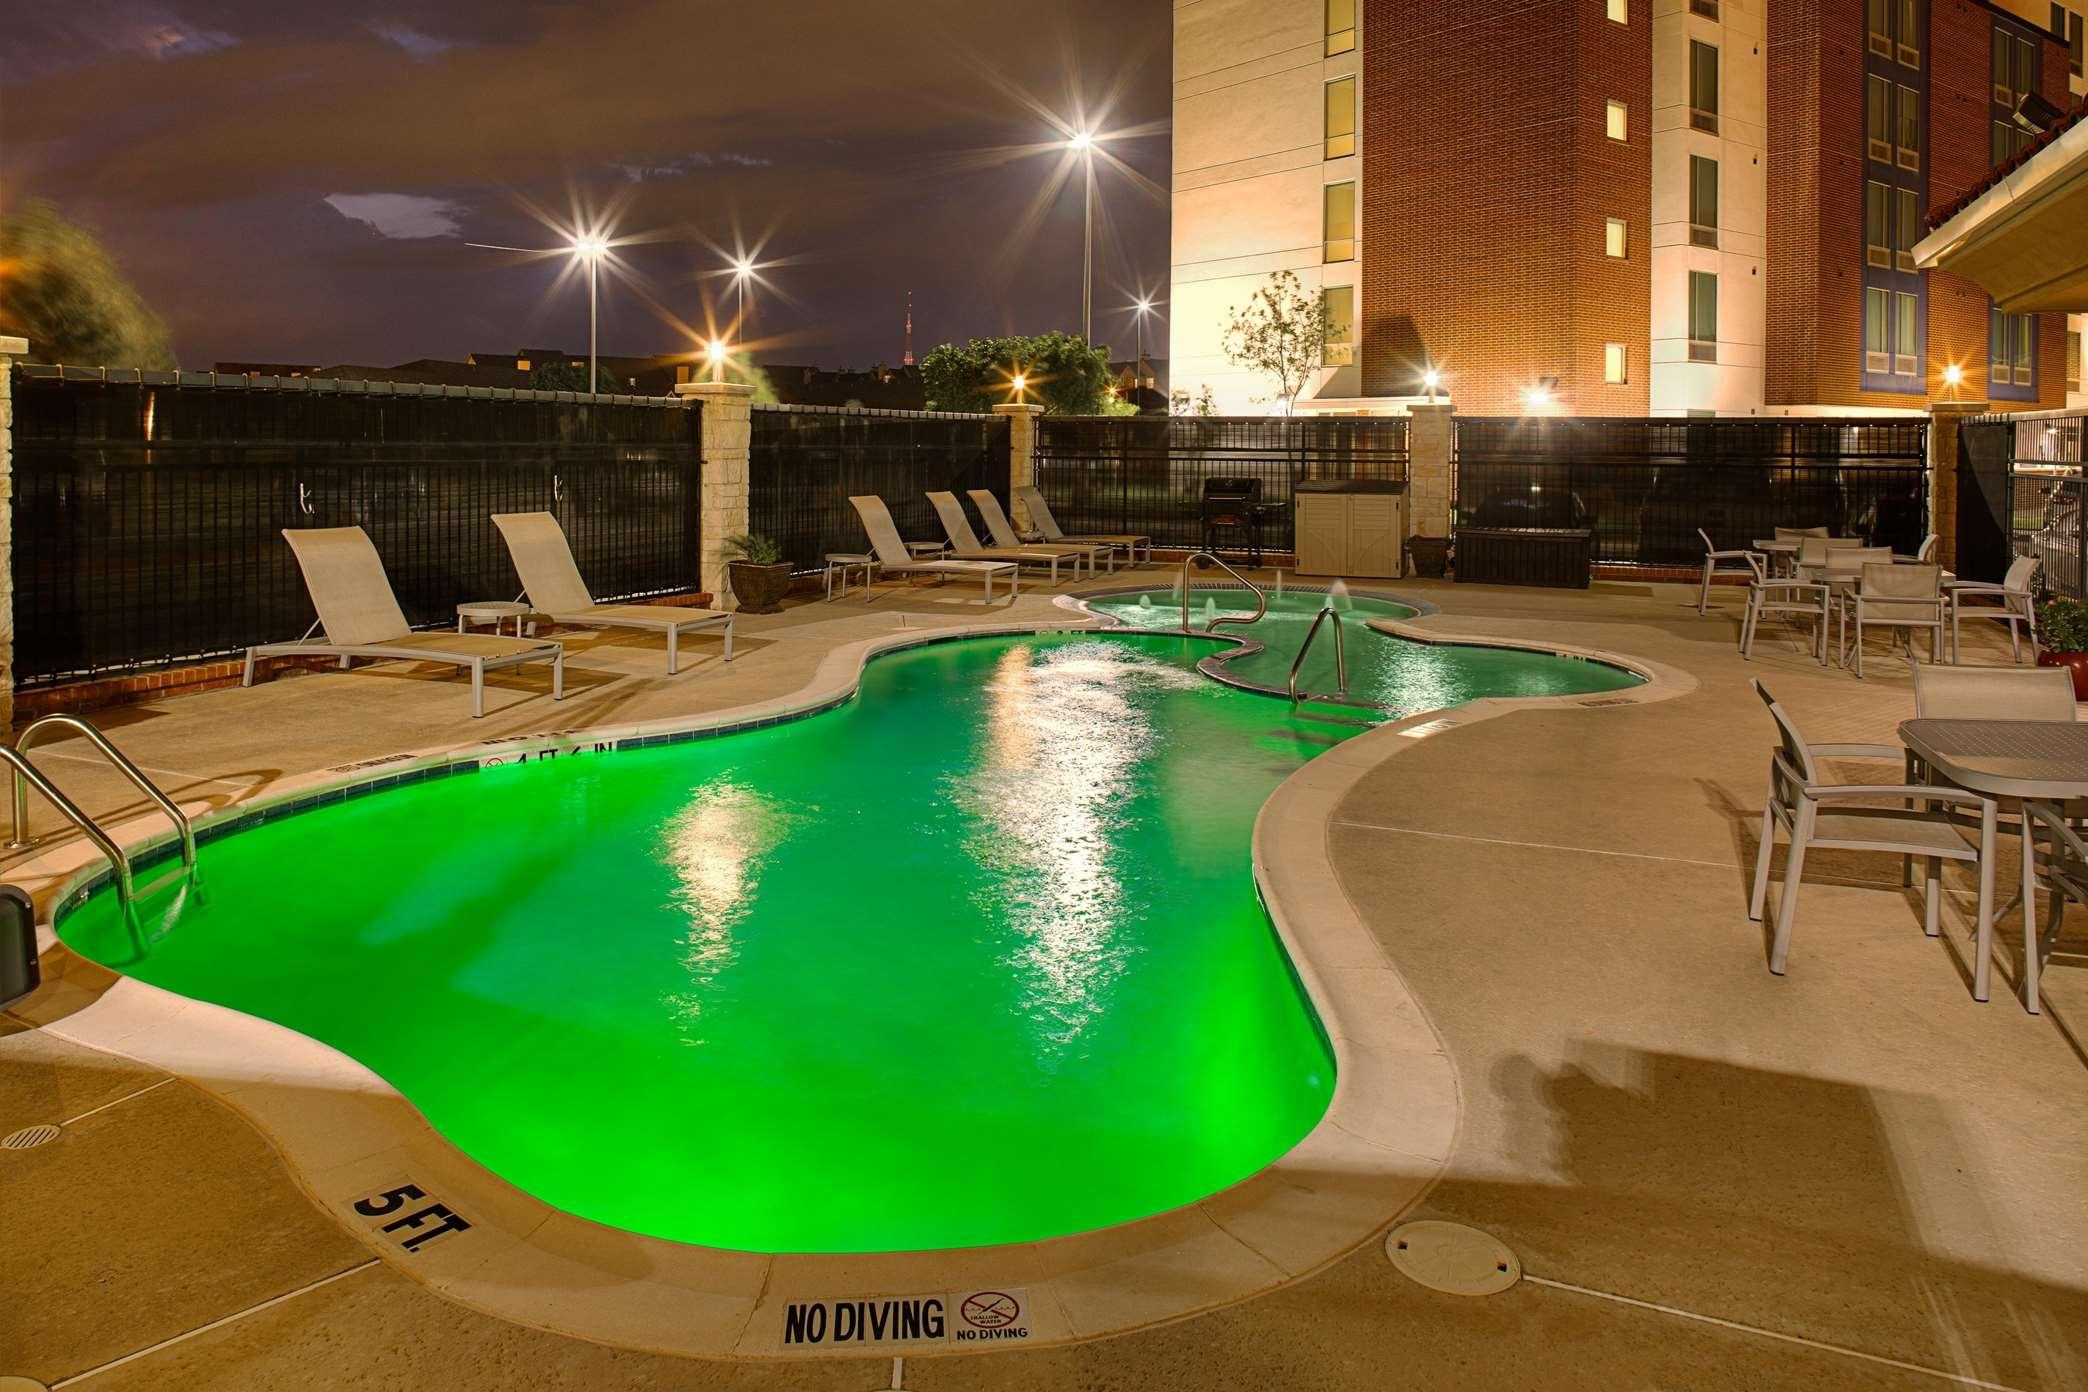 Hampton Inn & Suites Dallas/Lewisville-Vista Ridge Mall, TX image 34